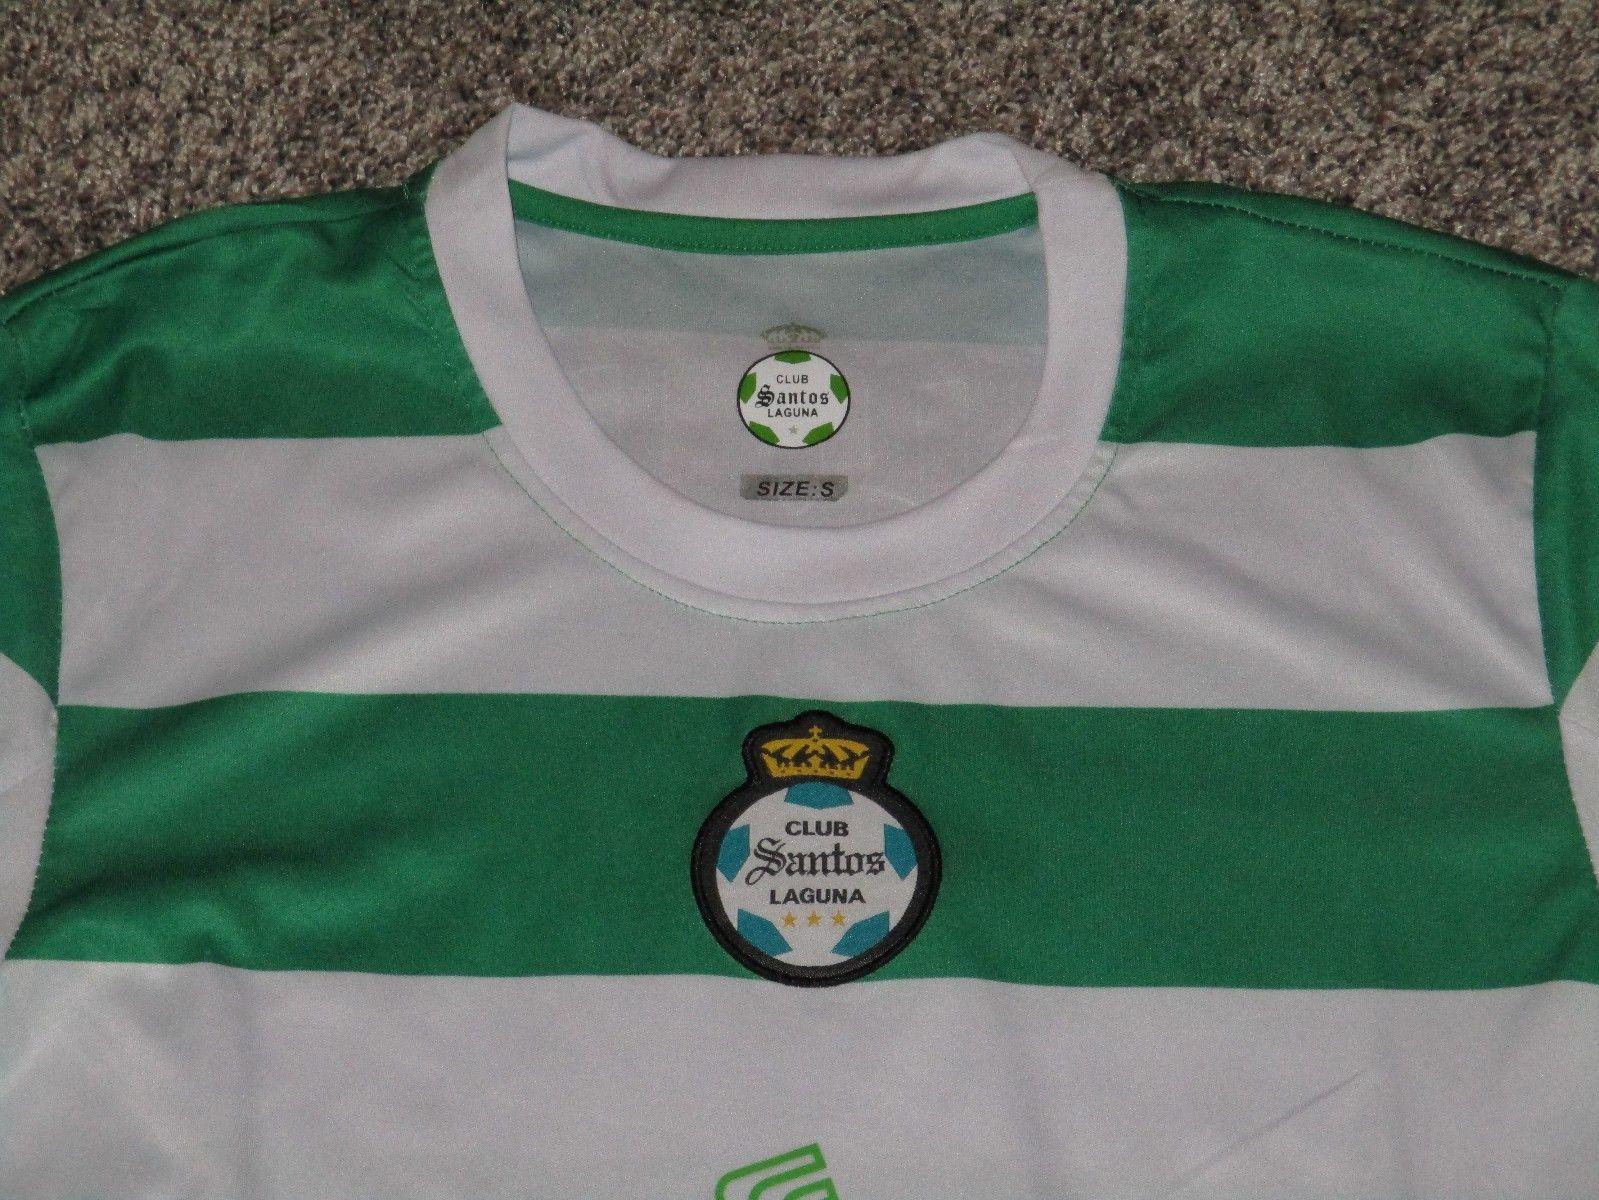 75d641f3c Club Santos Laguna Soccer Jersey Soriana Corona, Men's Small, Green & White